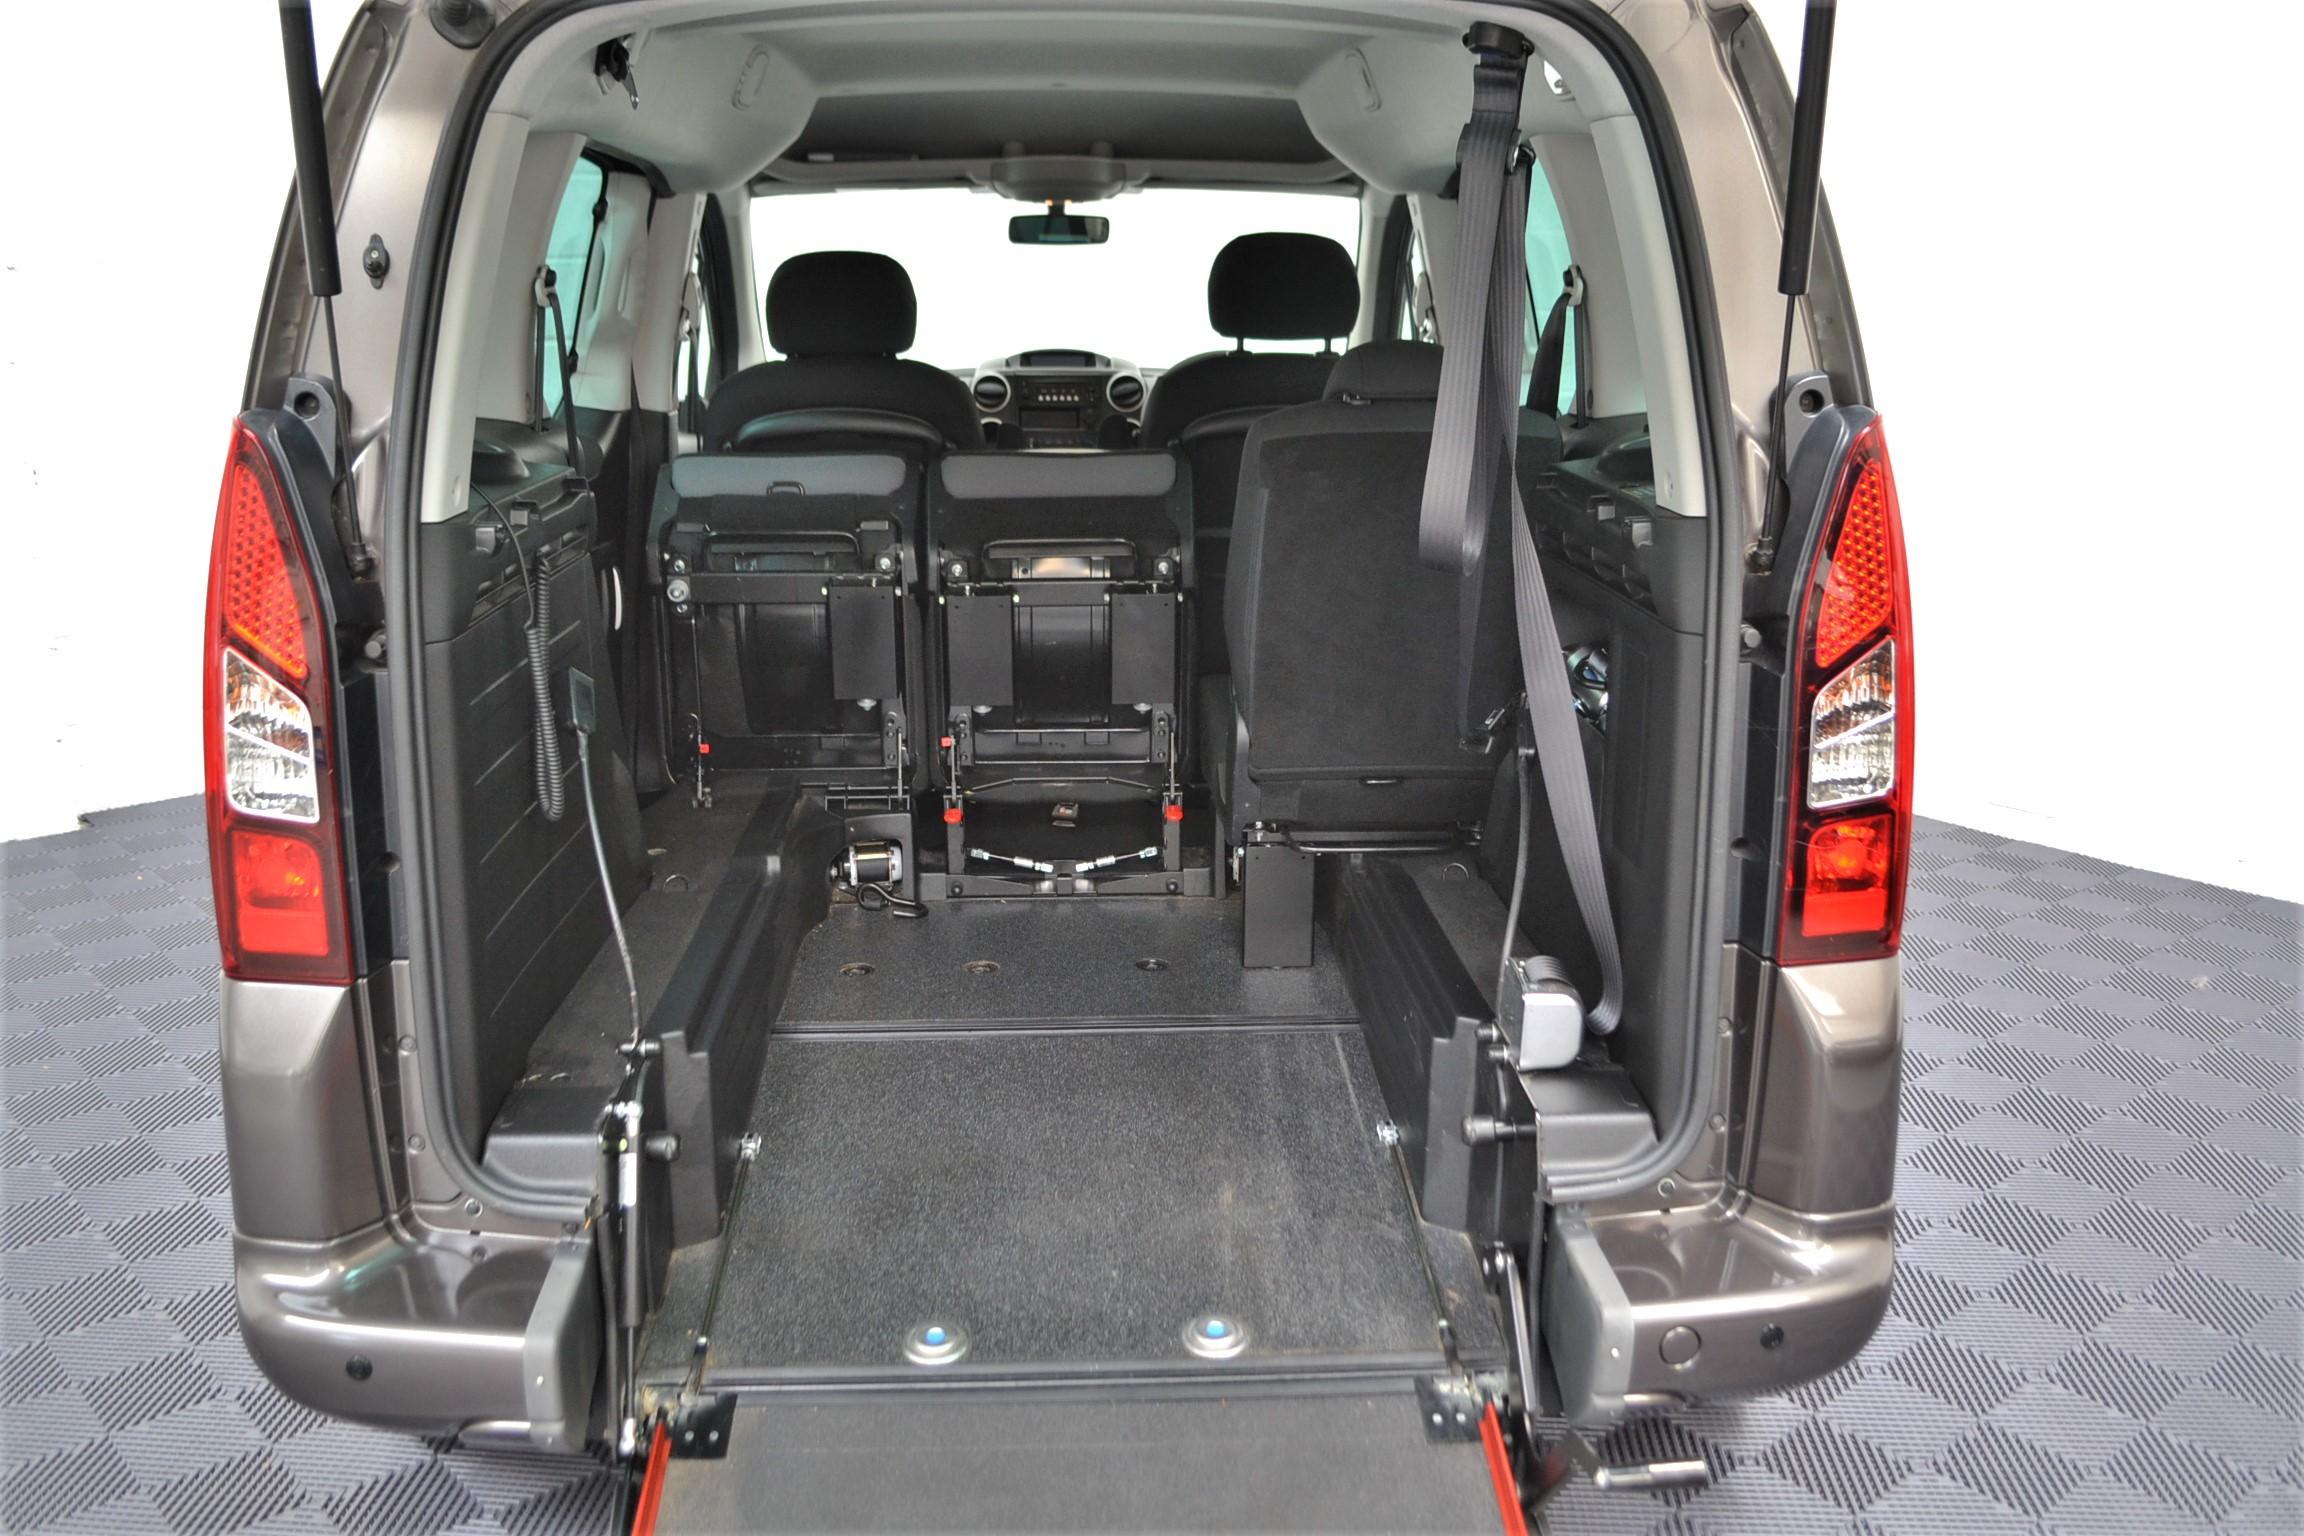 WAV Cars For Sale Bristol Wheelchair Accessible Vehicles Used For Sale Somerset Devon Dorset Bath Peugeot Partner WO16 HNH 4